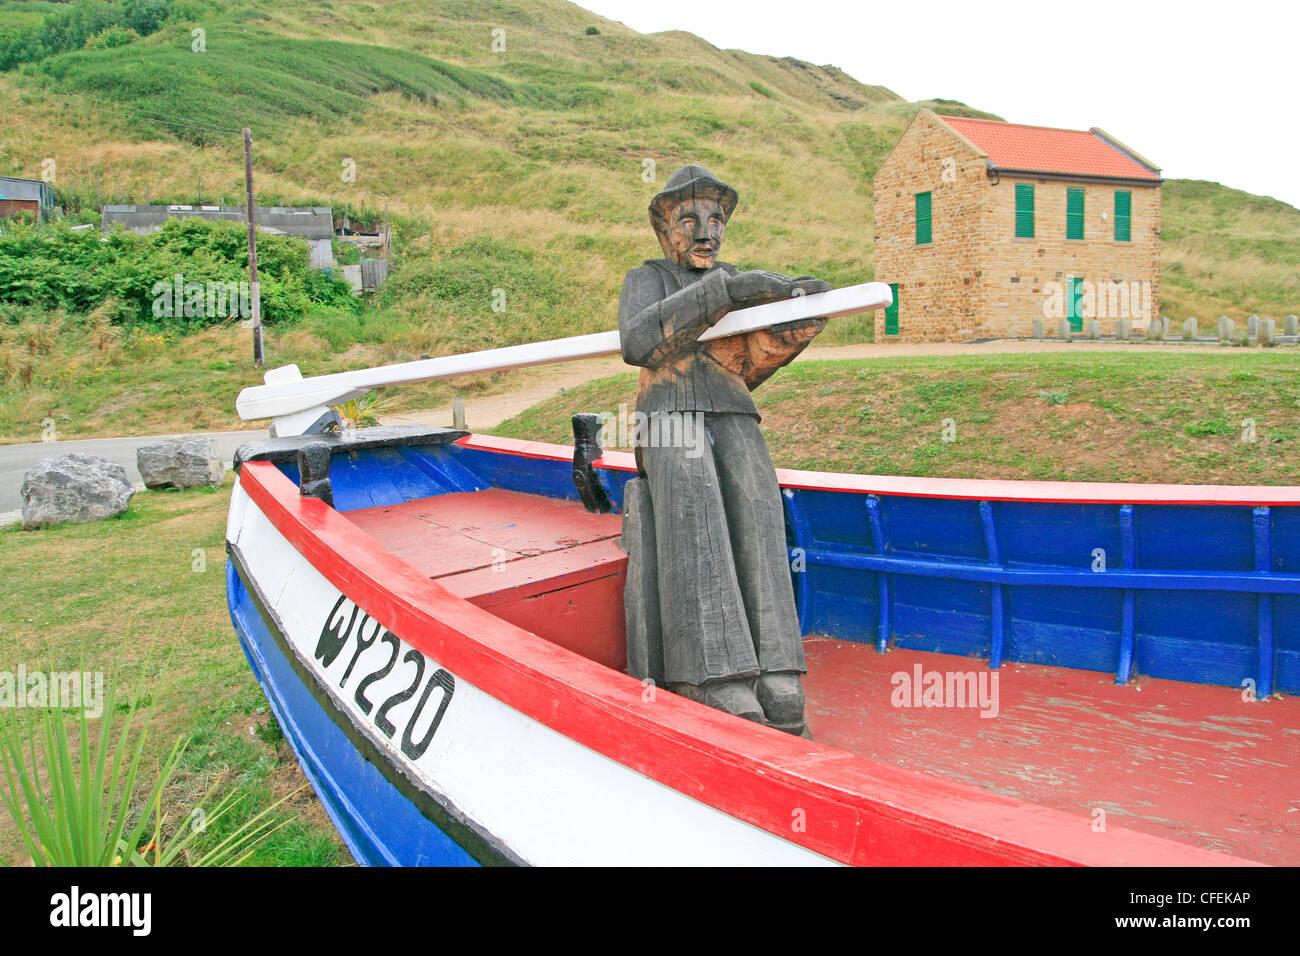 Rebus coble mariners memorial Skinningrove Cleveland England UK - Stock Image